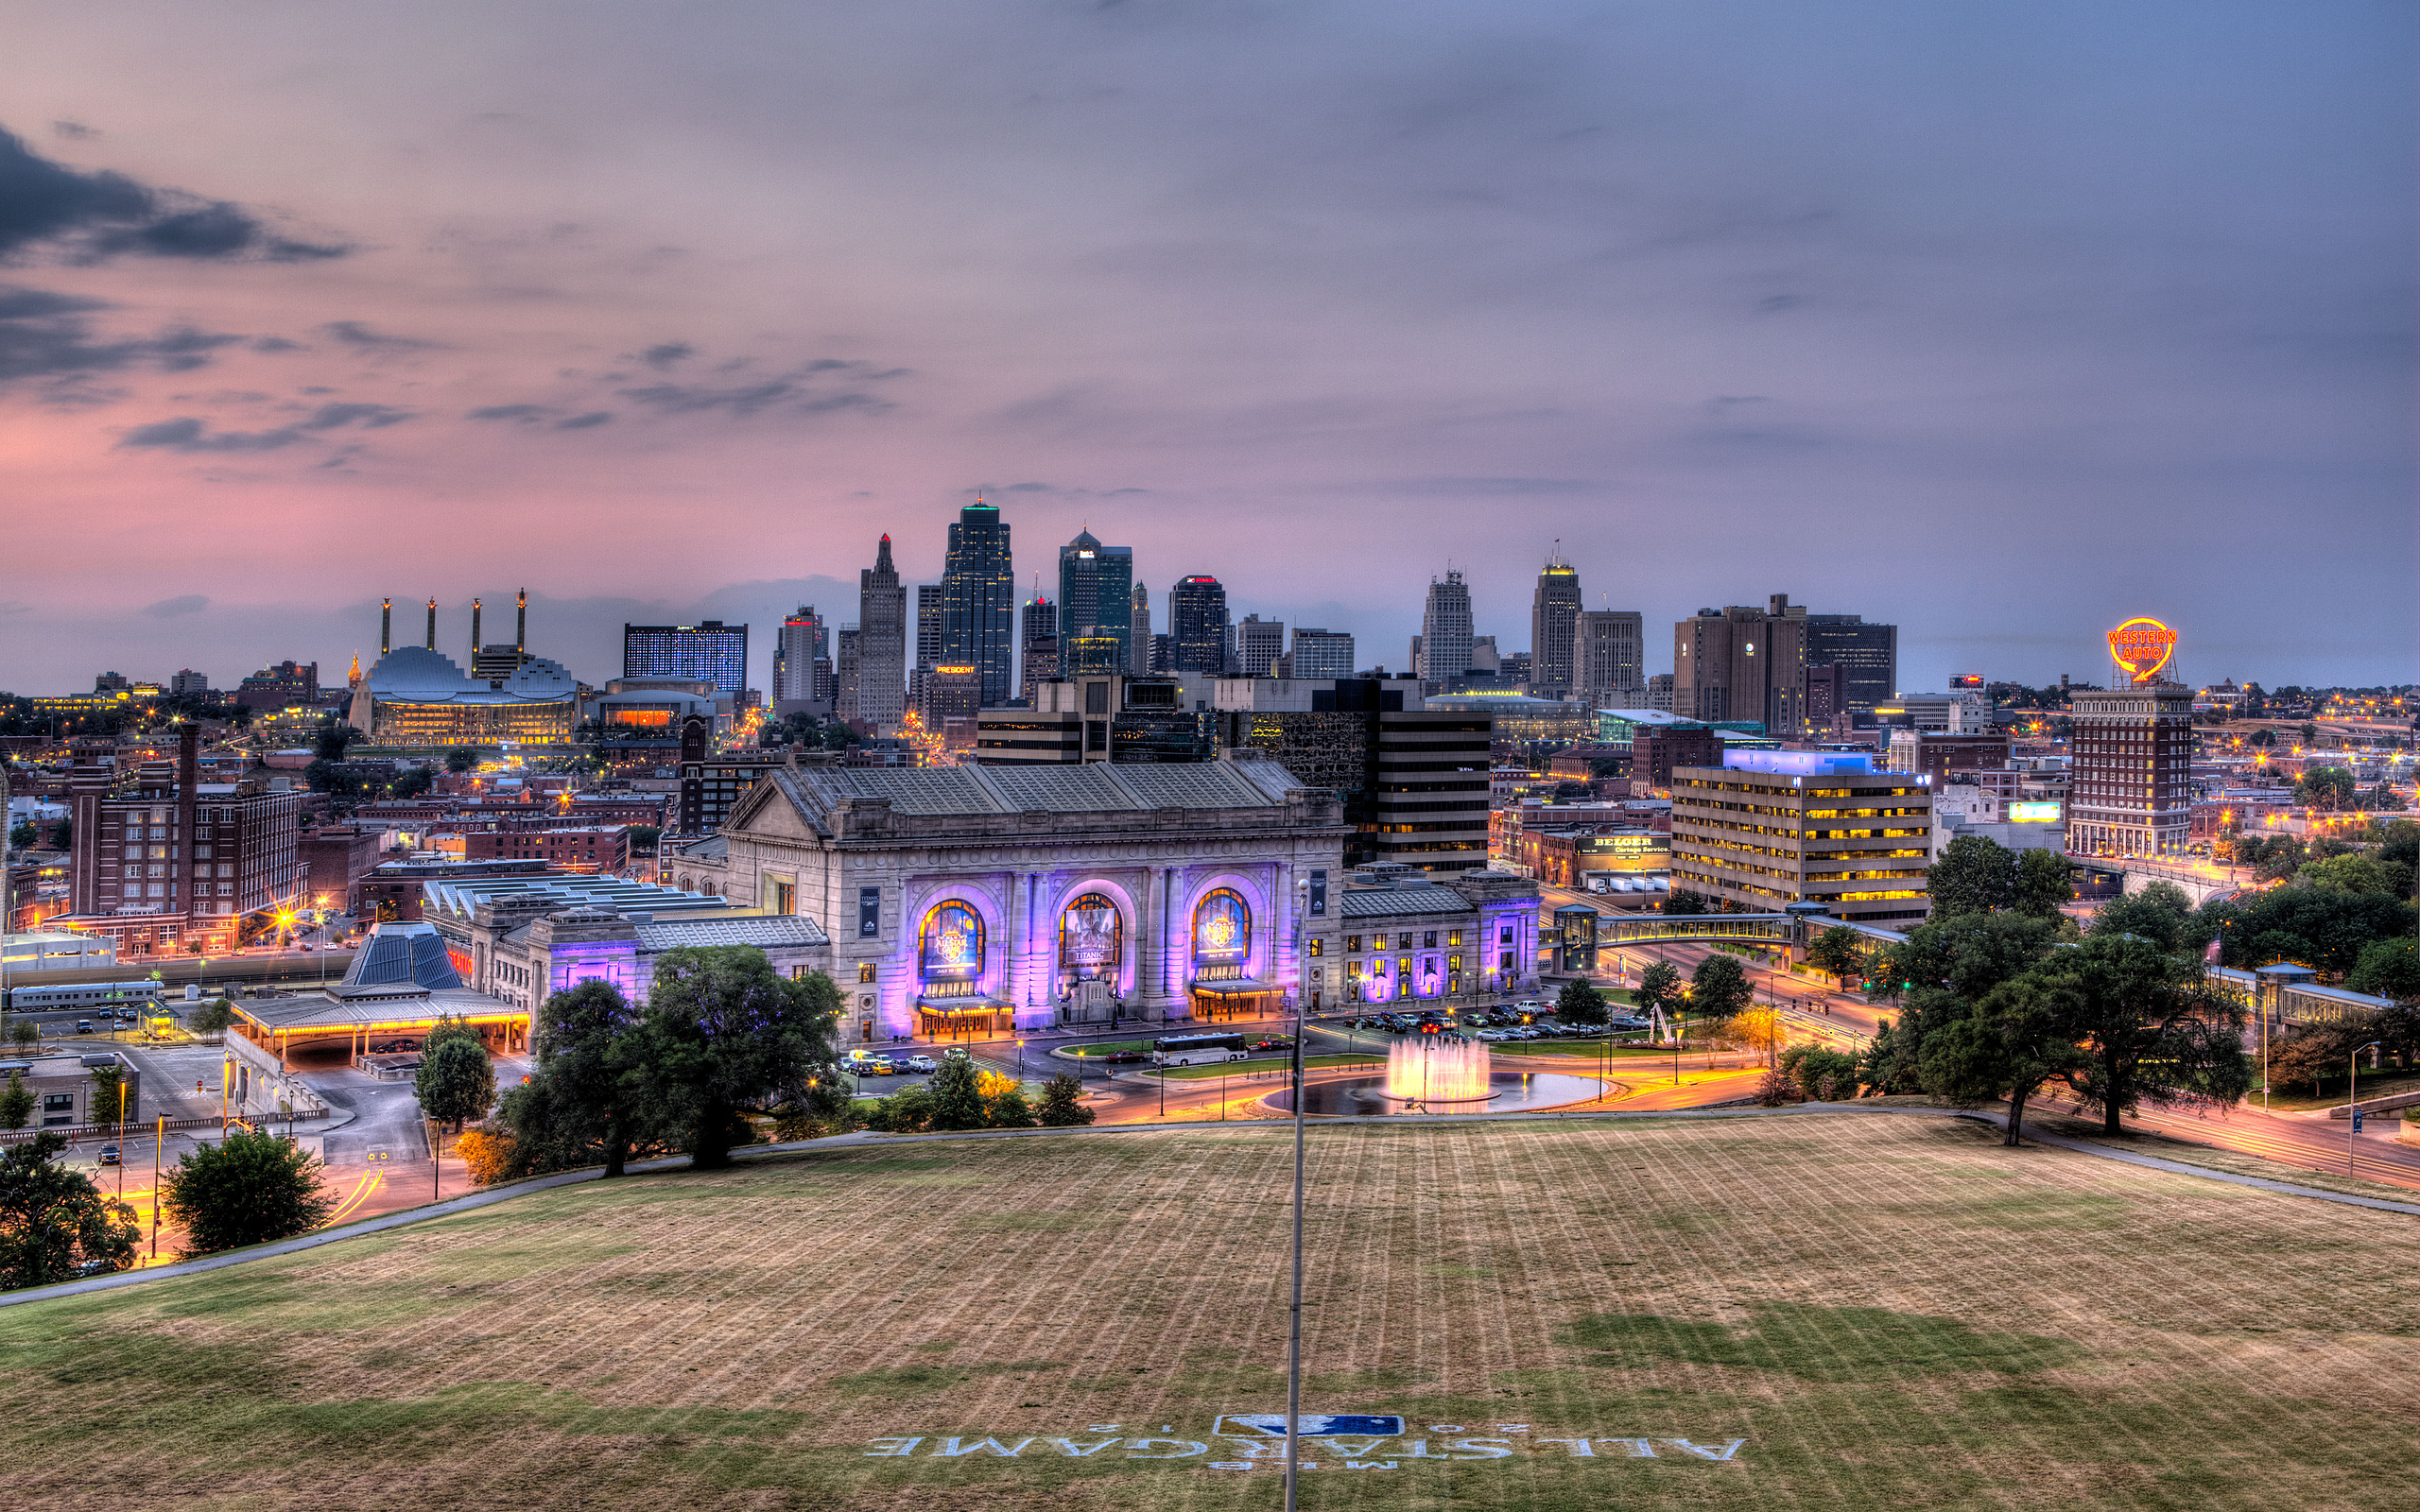 Kansas City USA wallpaper background 2560x1600